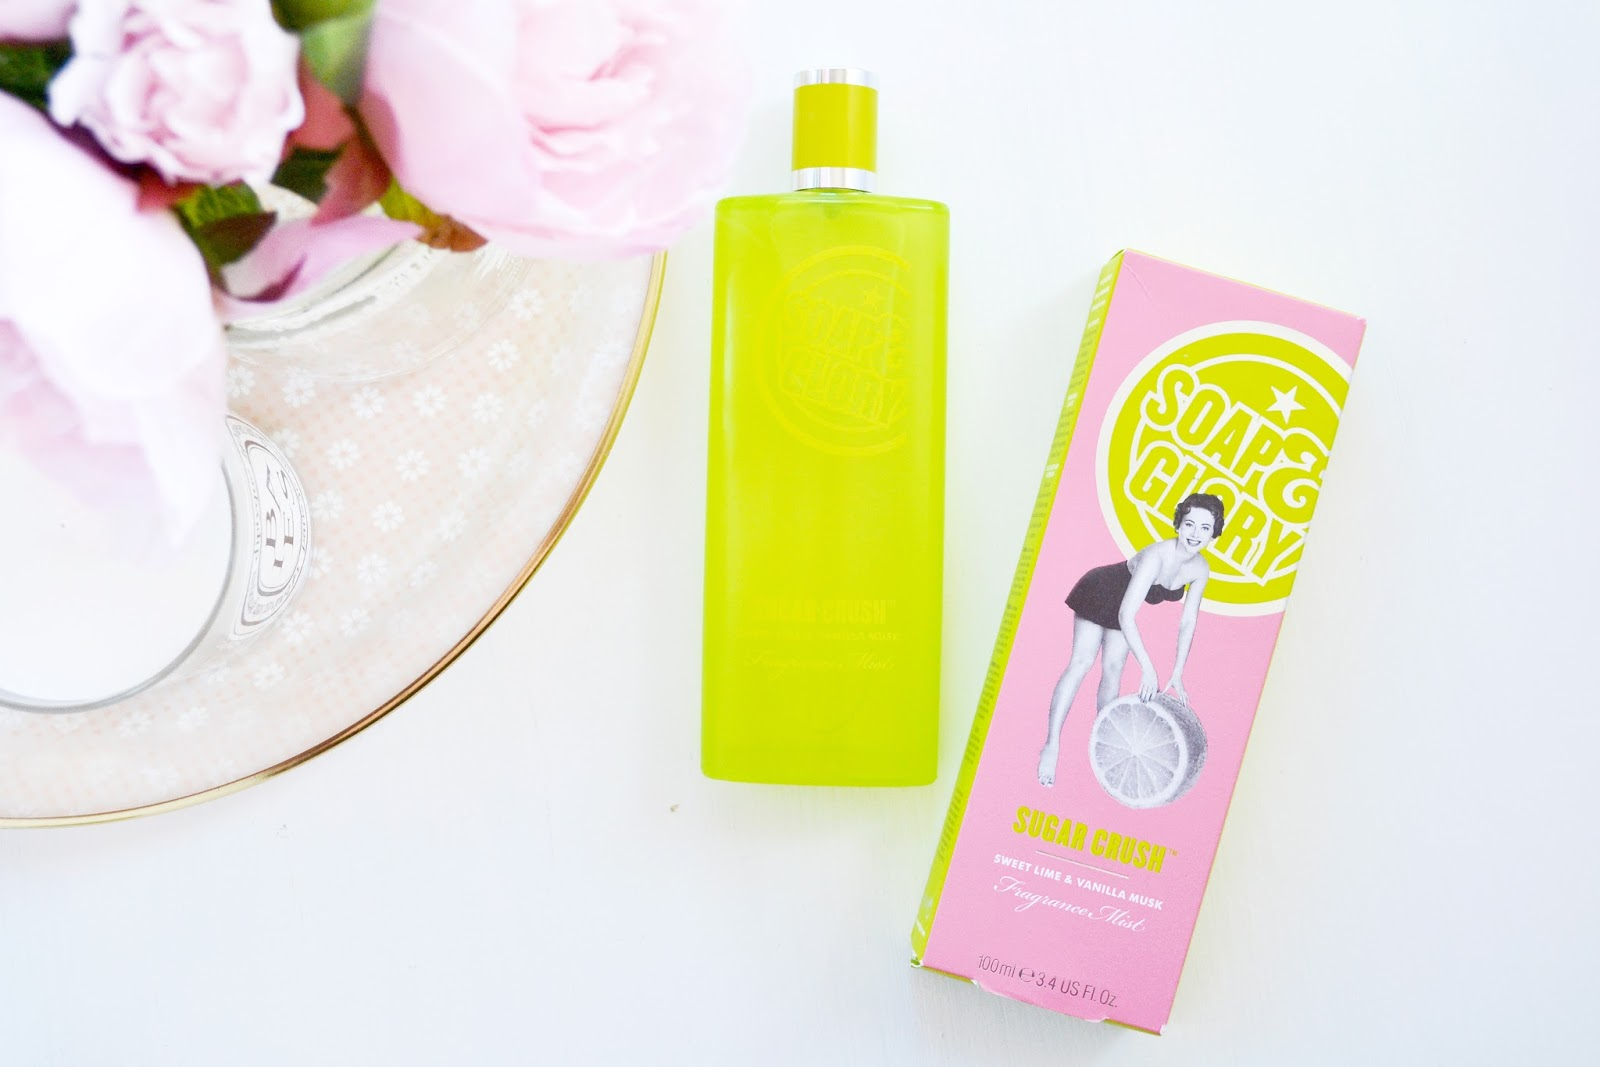 Soap And Glory's Sugar Crush Fragrance